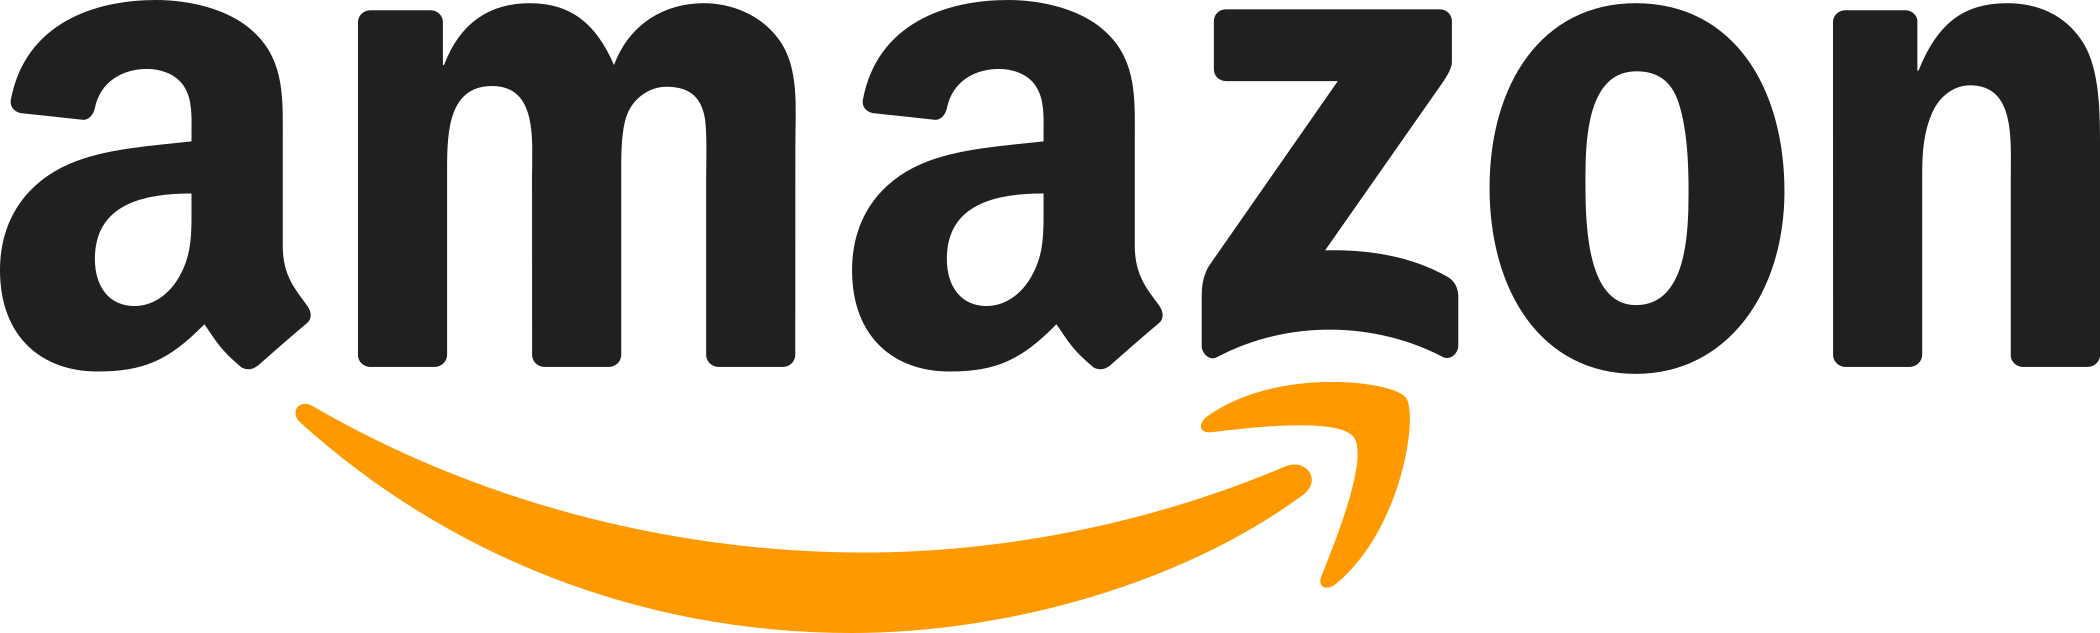 amazon logo 2 - Amazon Logo